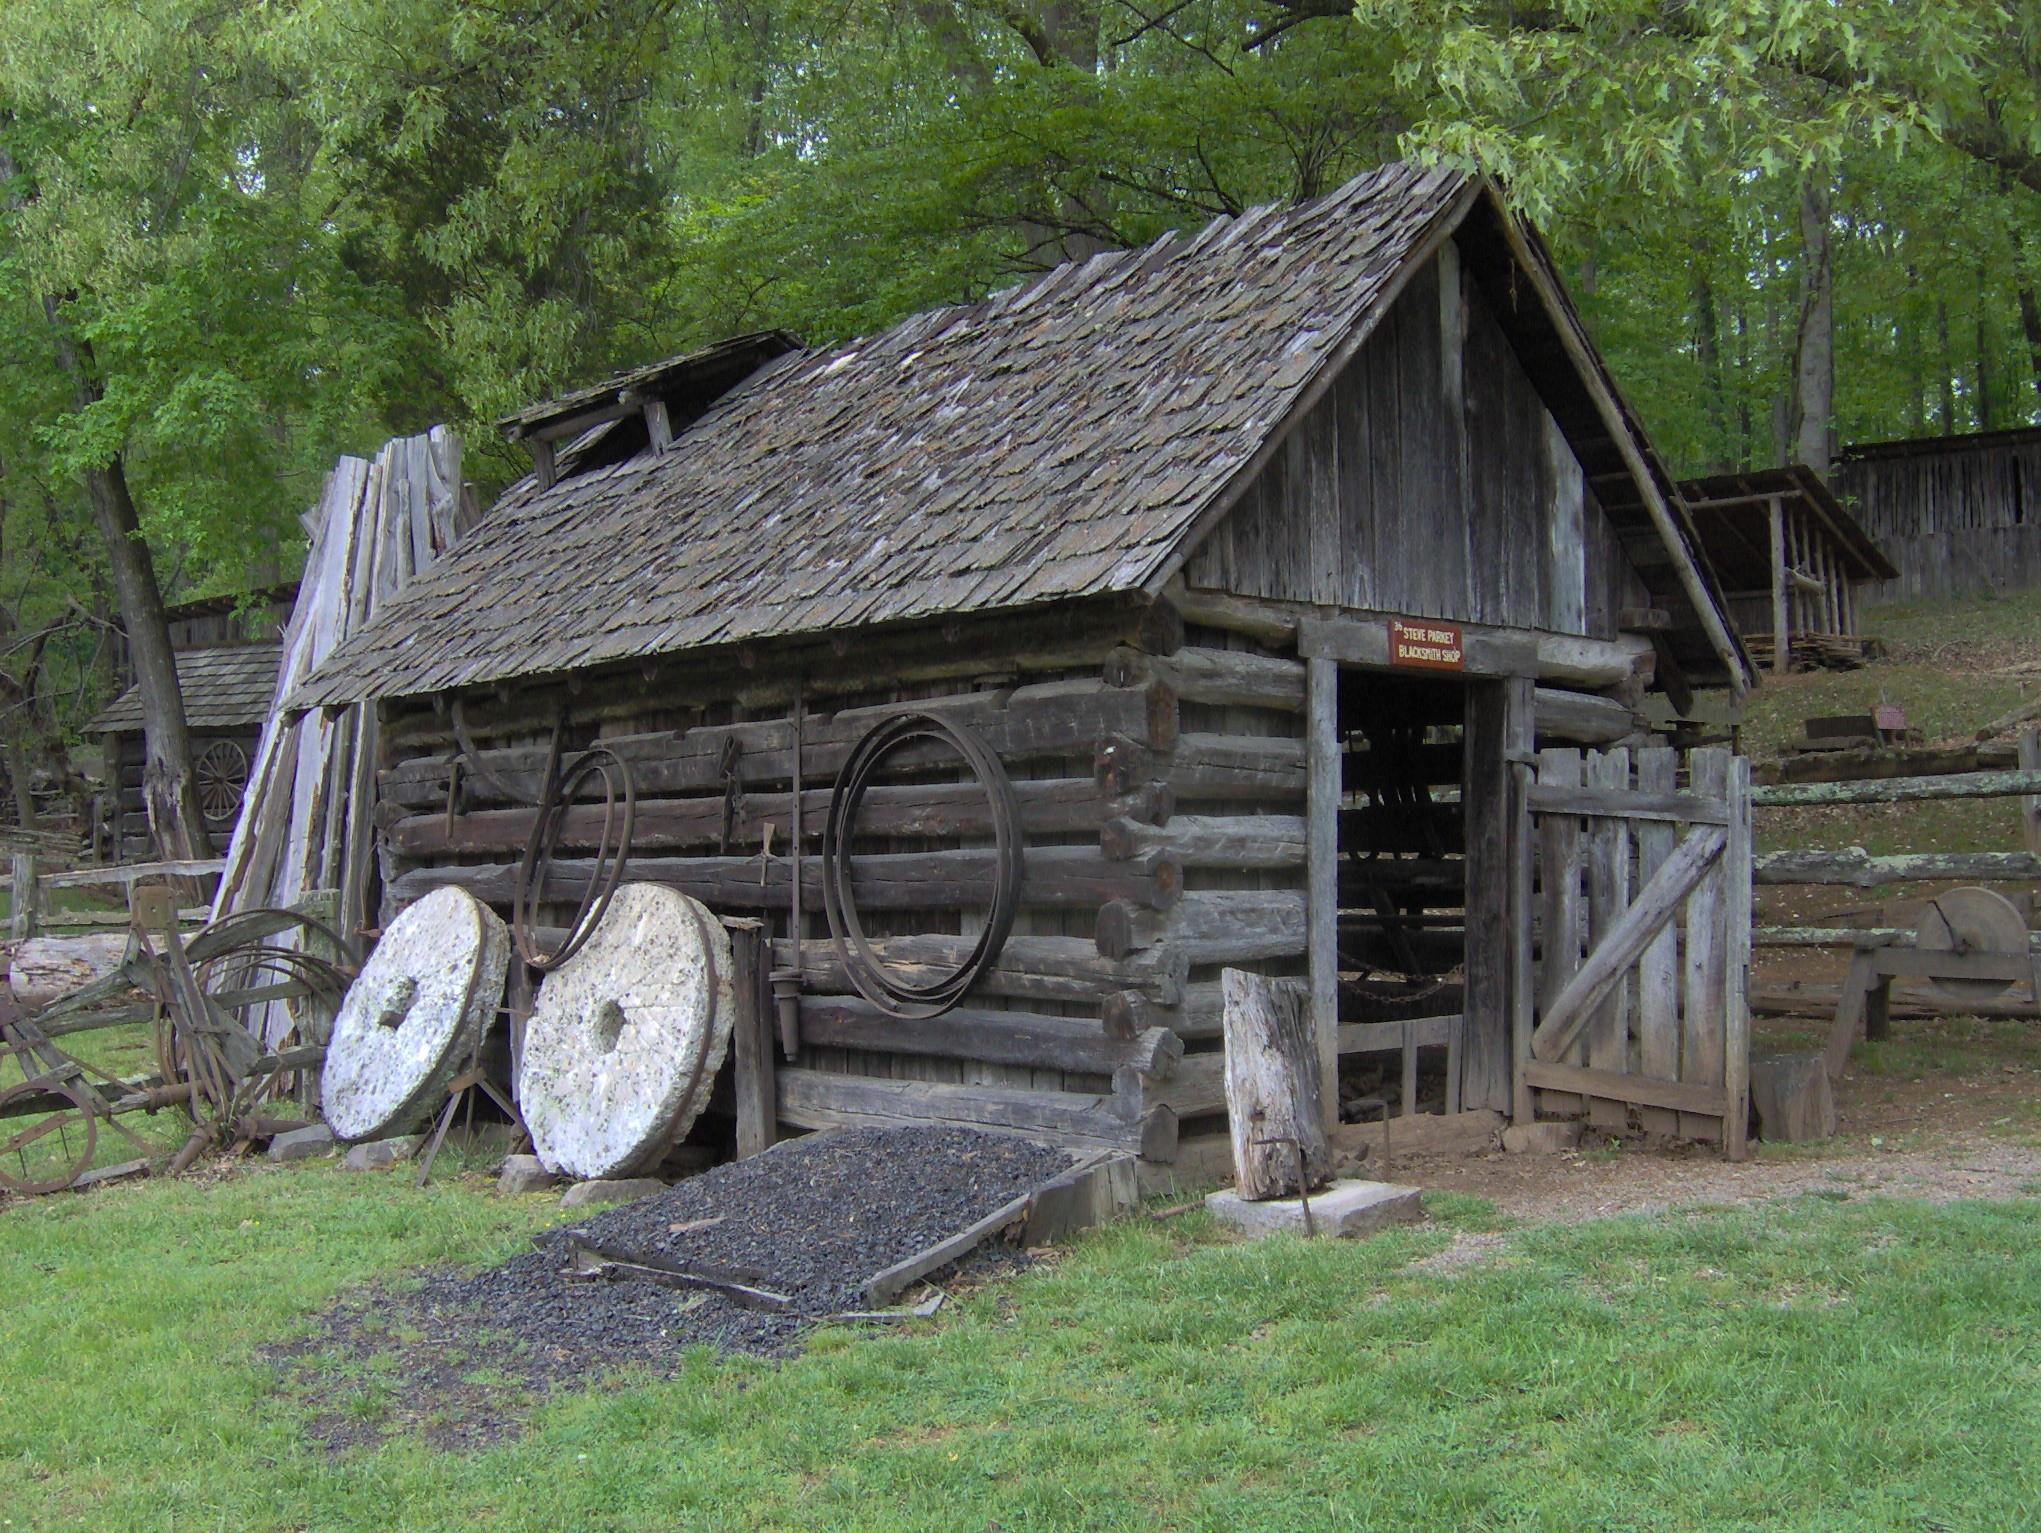 FileParkey blacksmith shop tn1jpg Wikimedia Commons